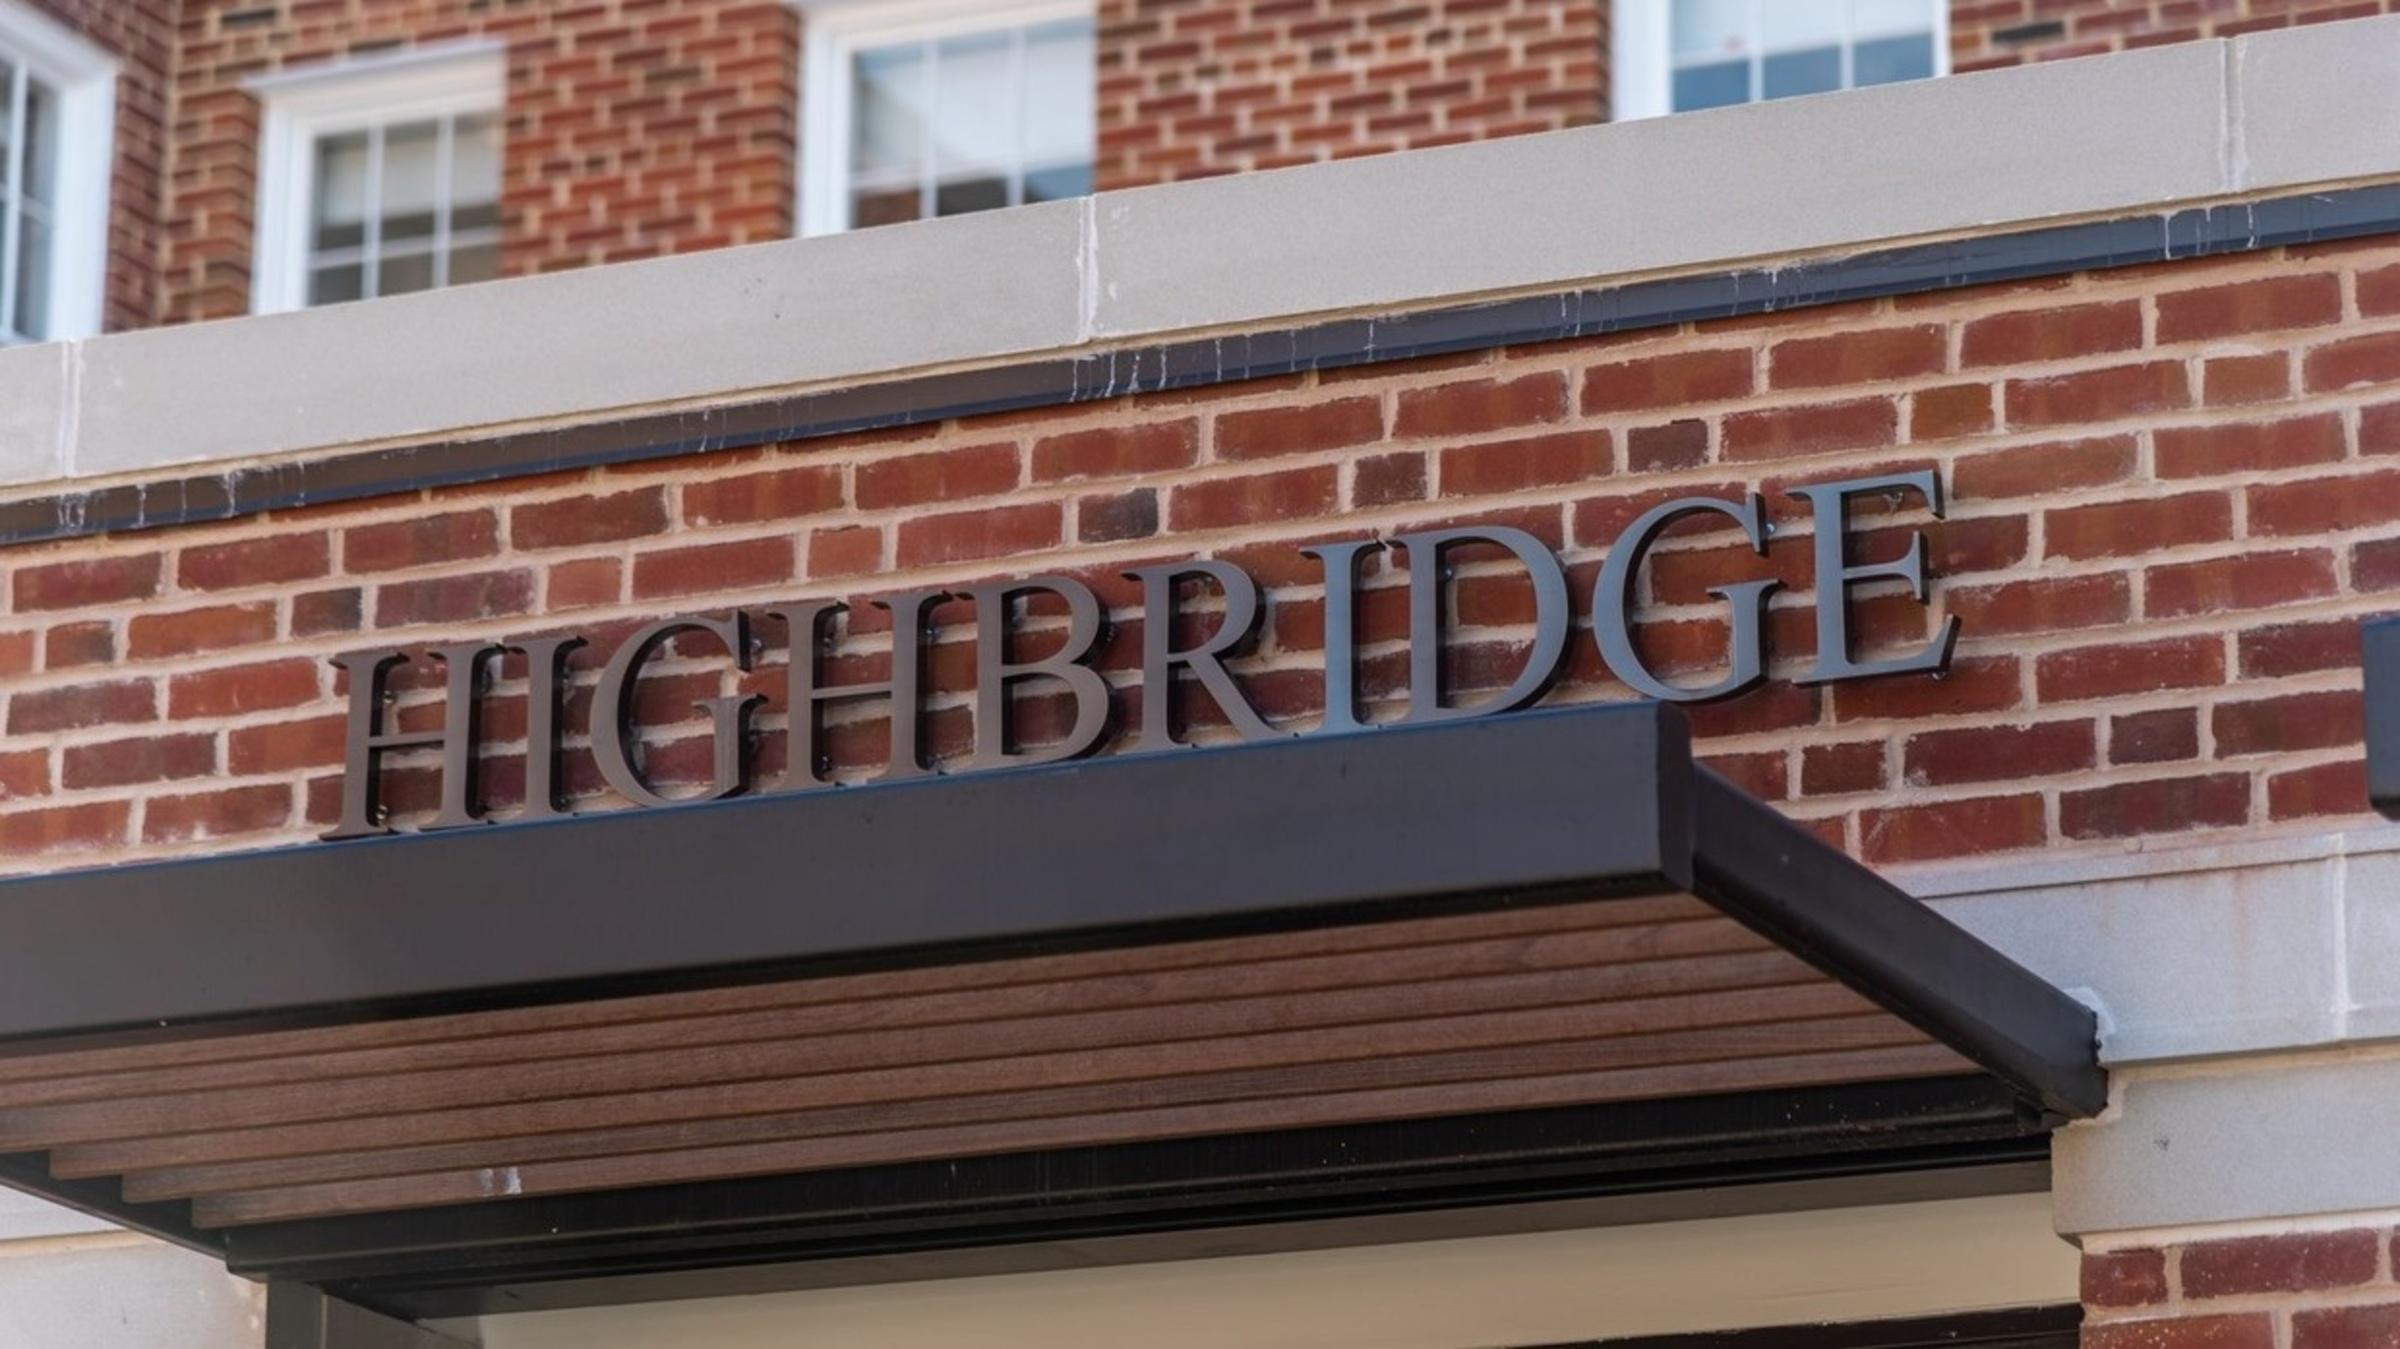 Highbridge 176